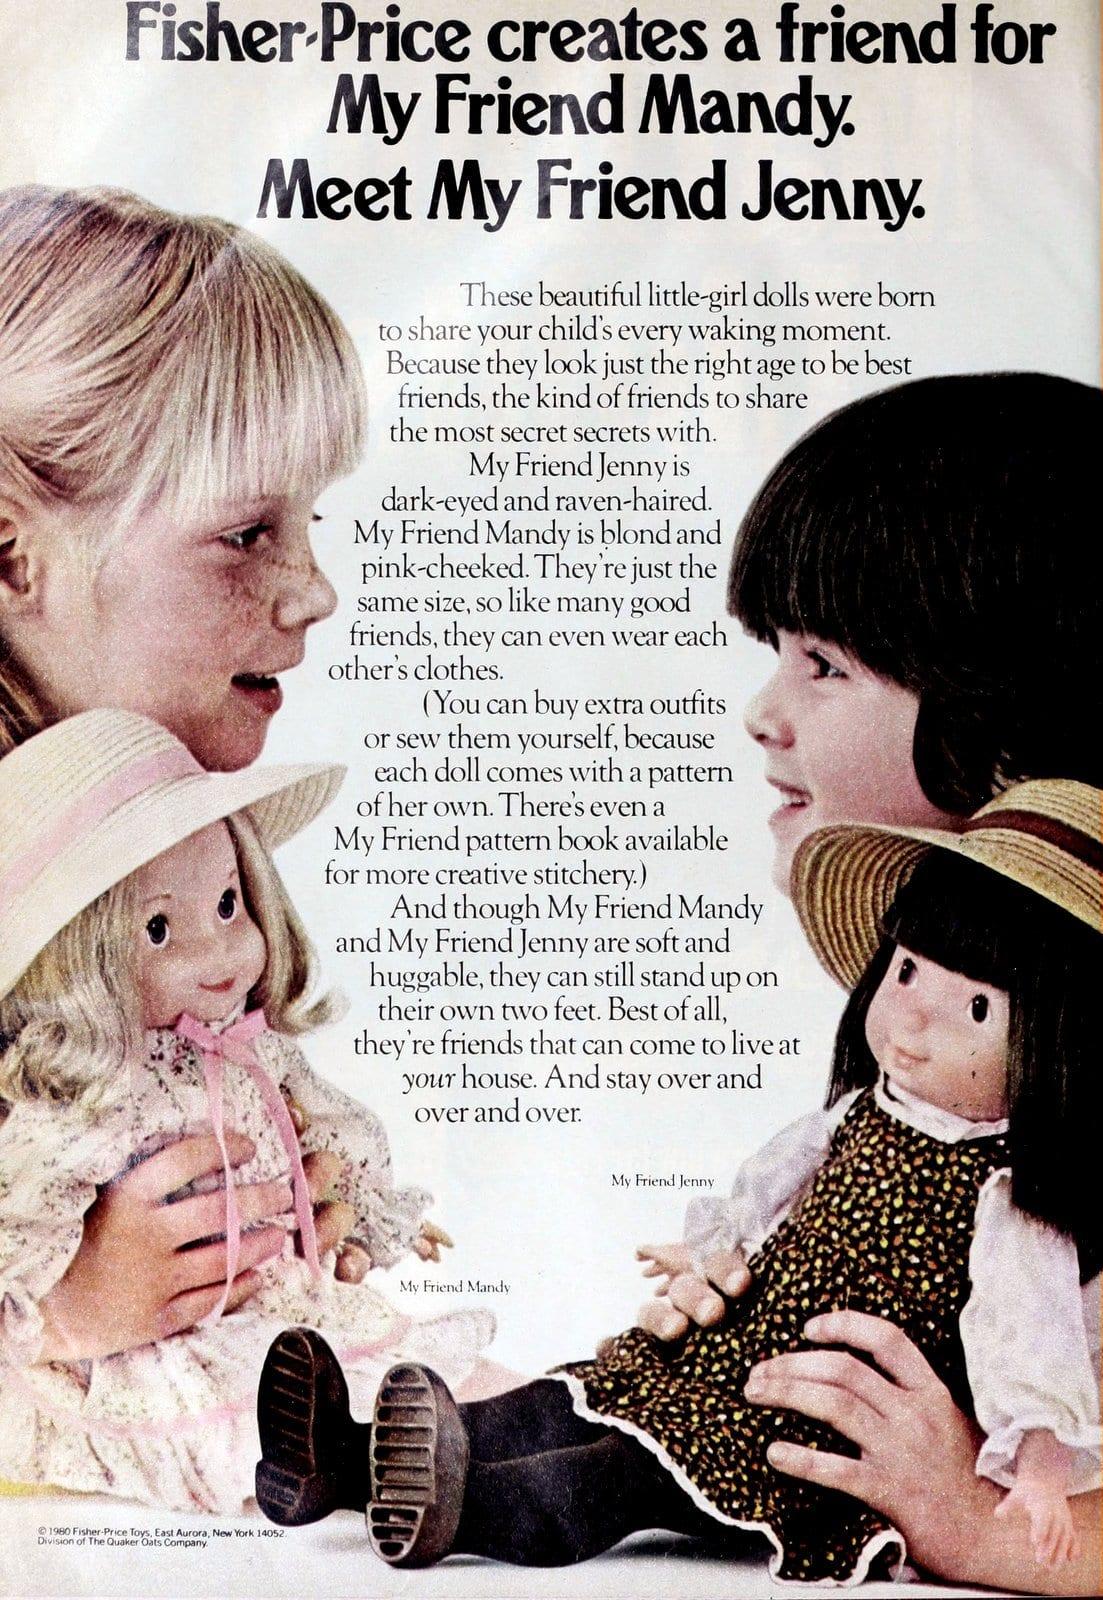 Fisher-Price My Friend Jenny companion doll (1980)